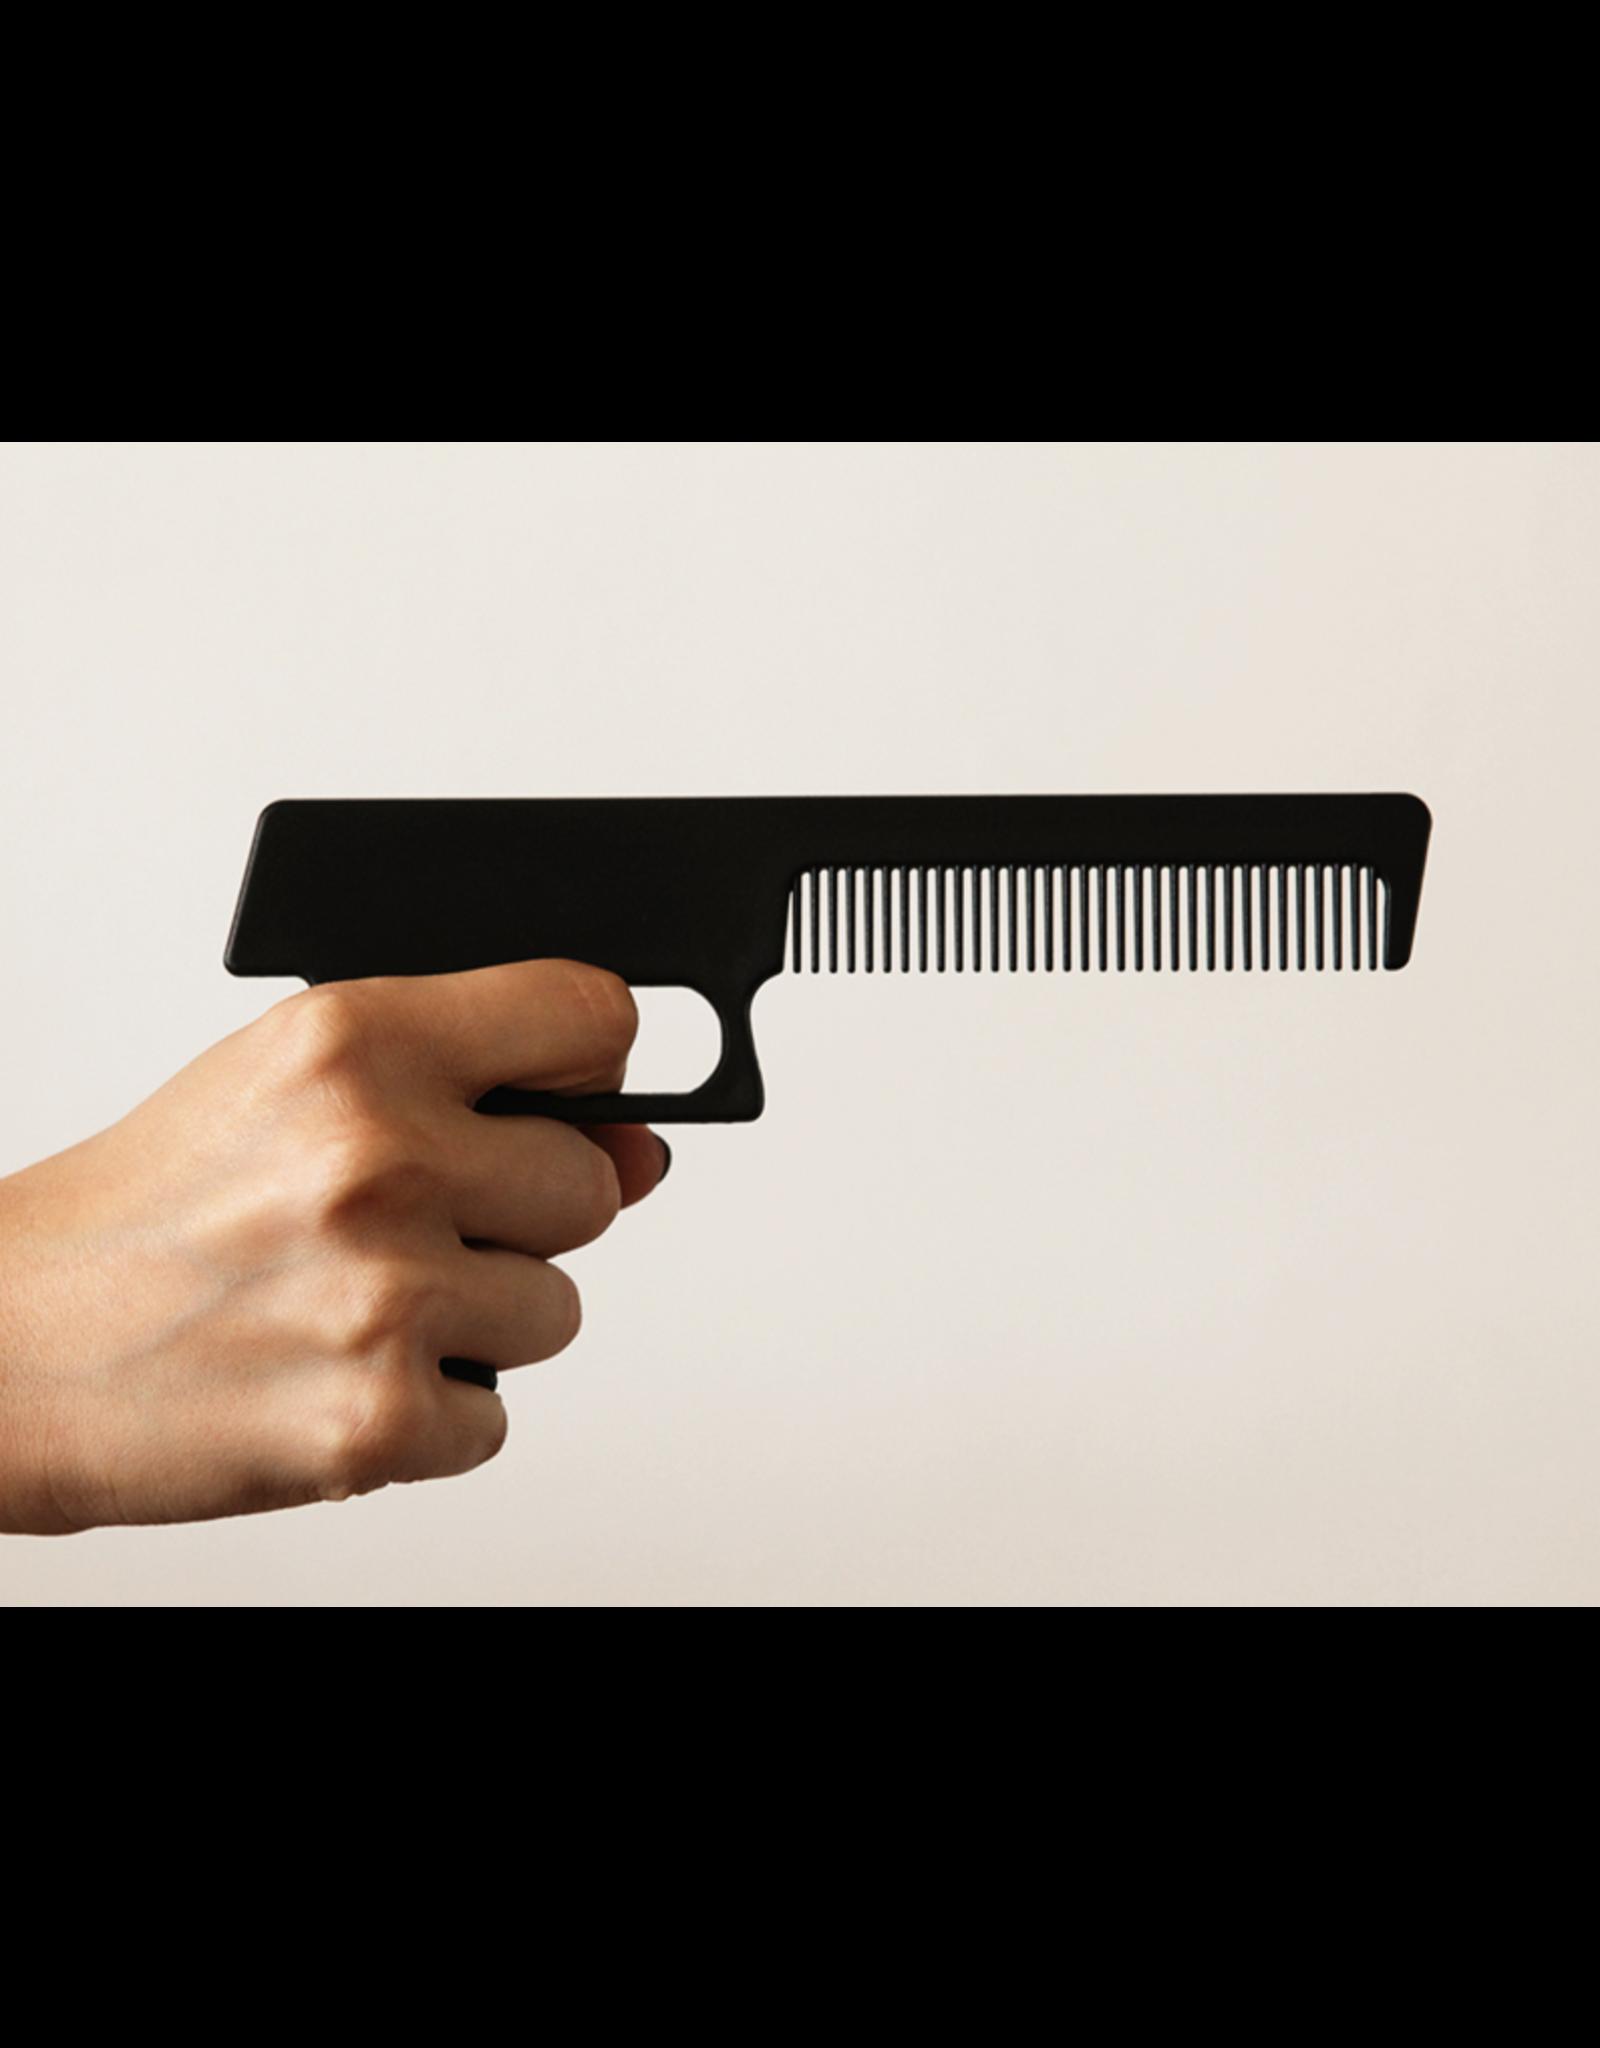 comb - revolver